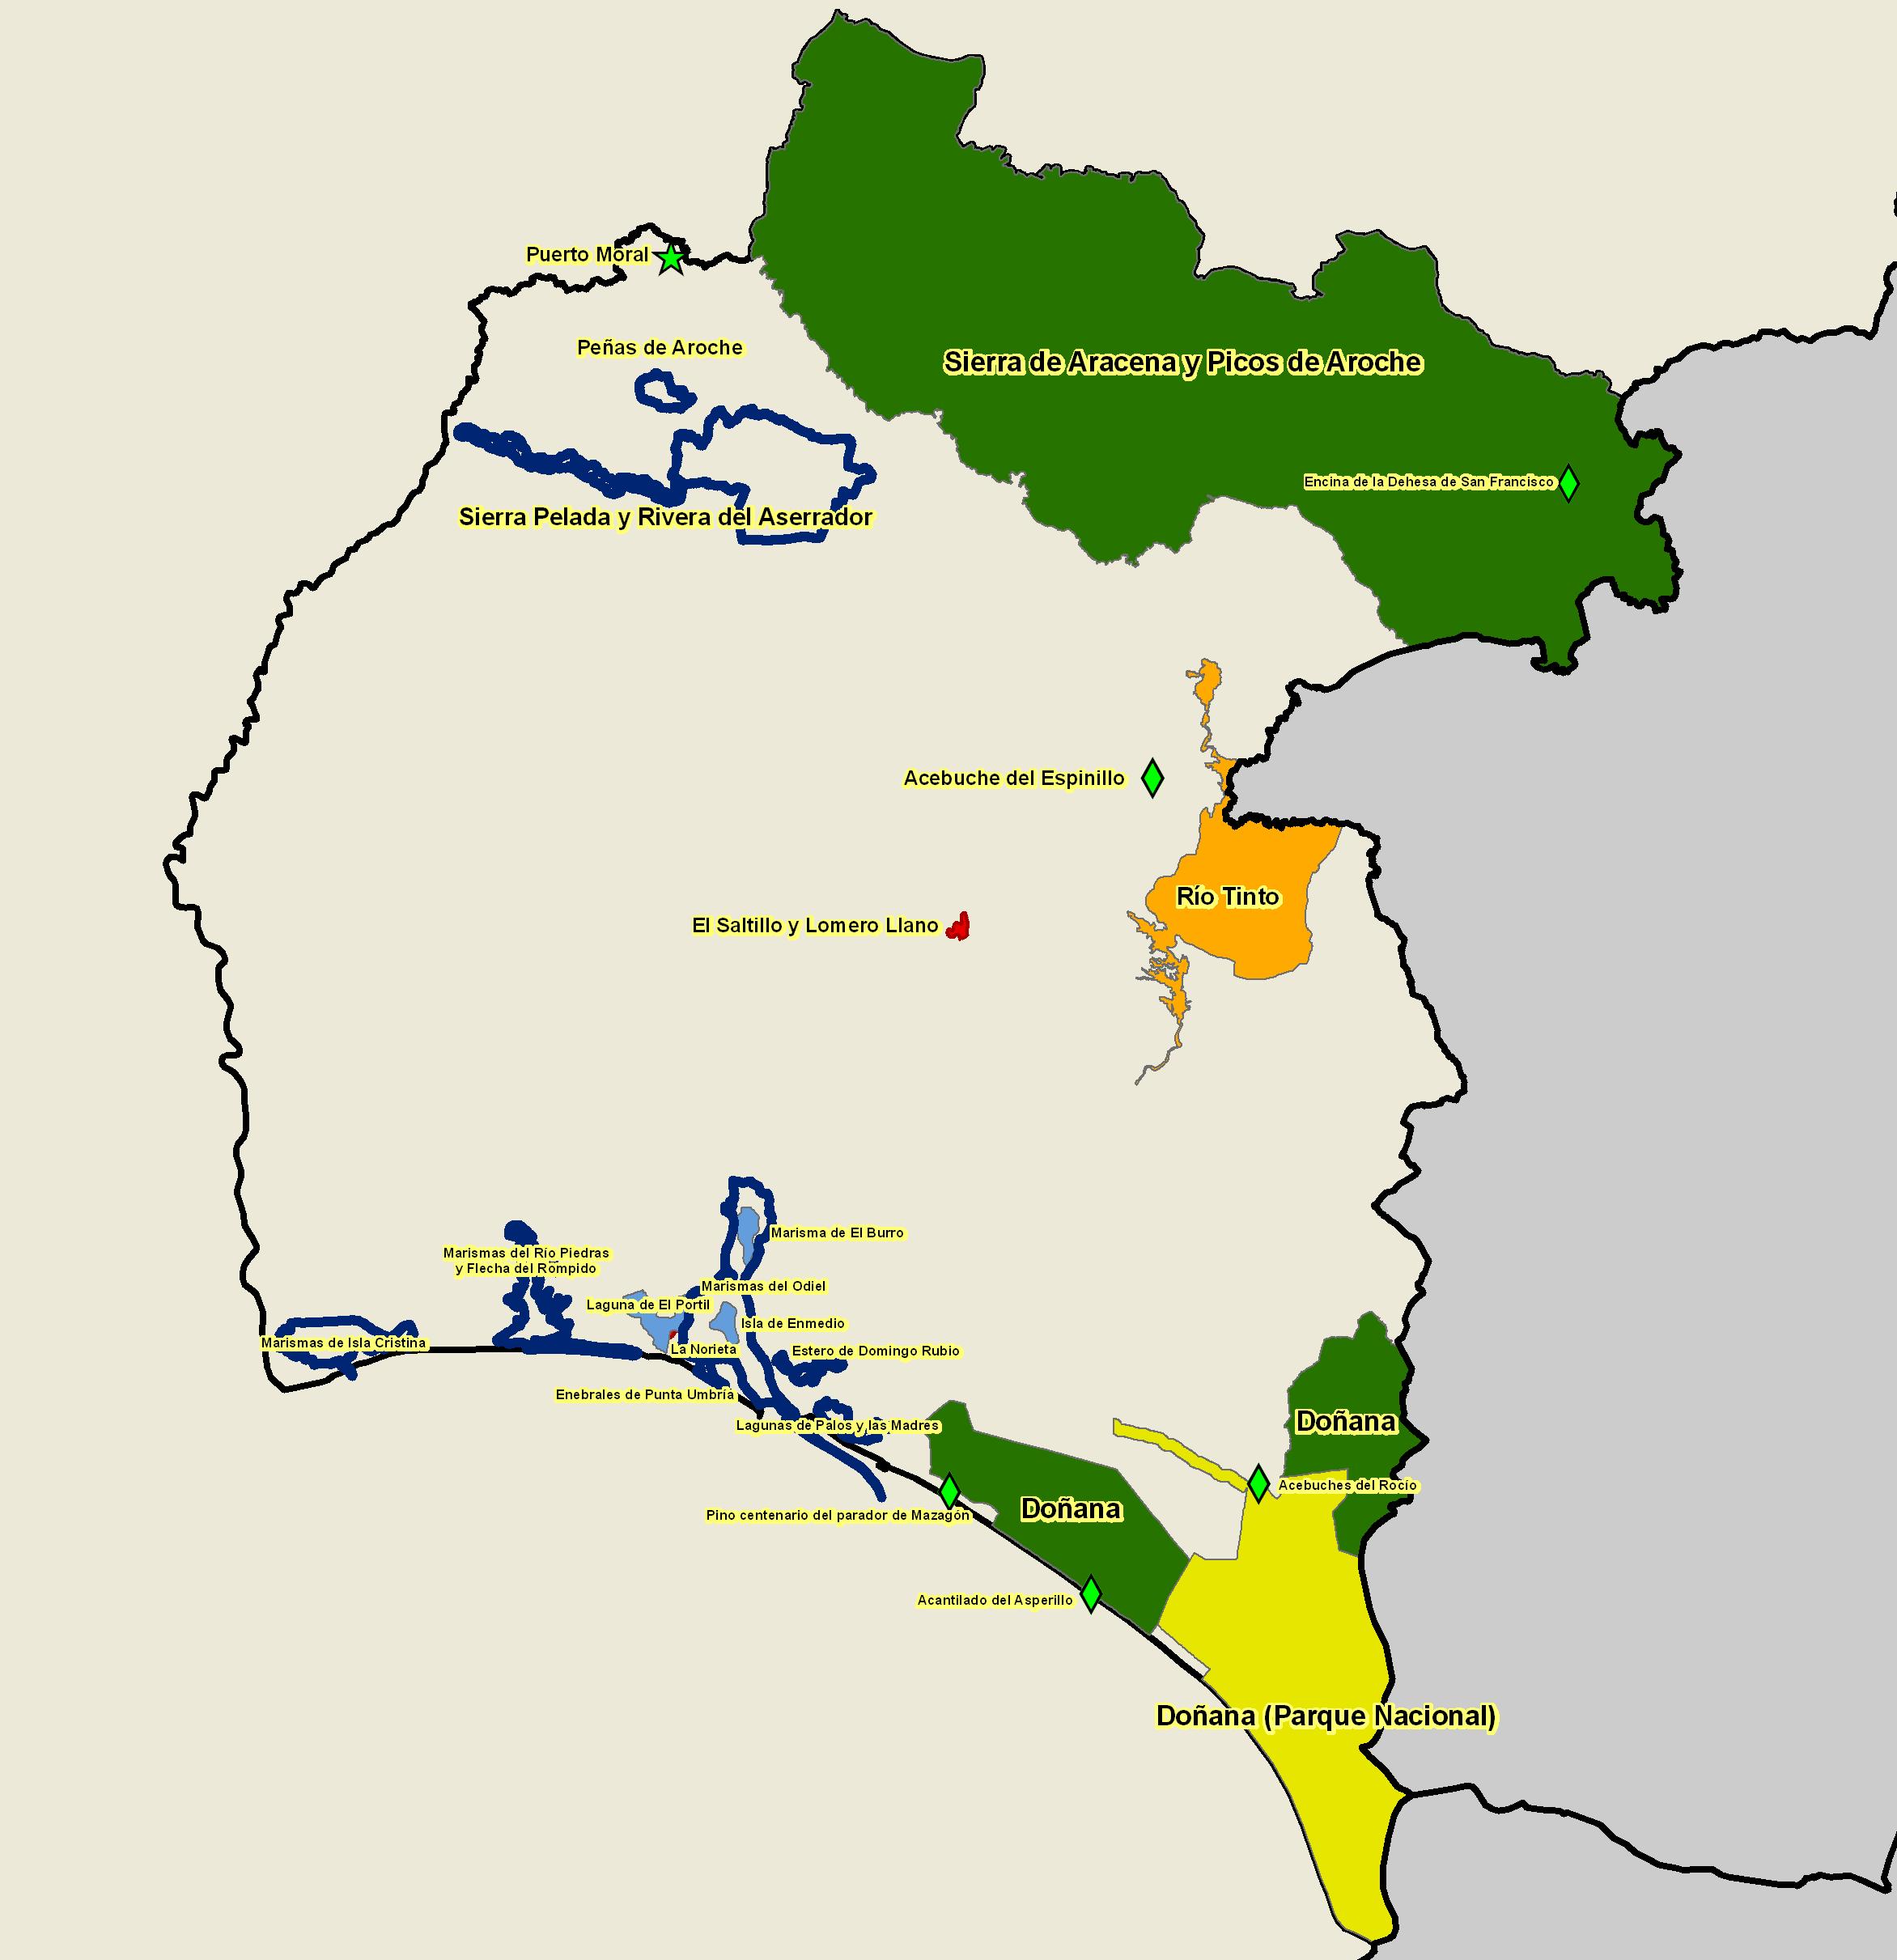 Espacios naturales protegidos en la Provincia de Huelva 2008